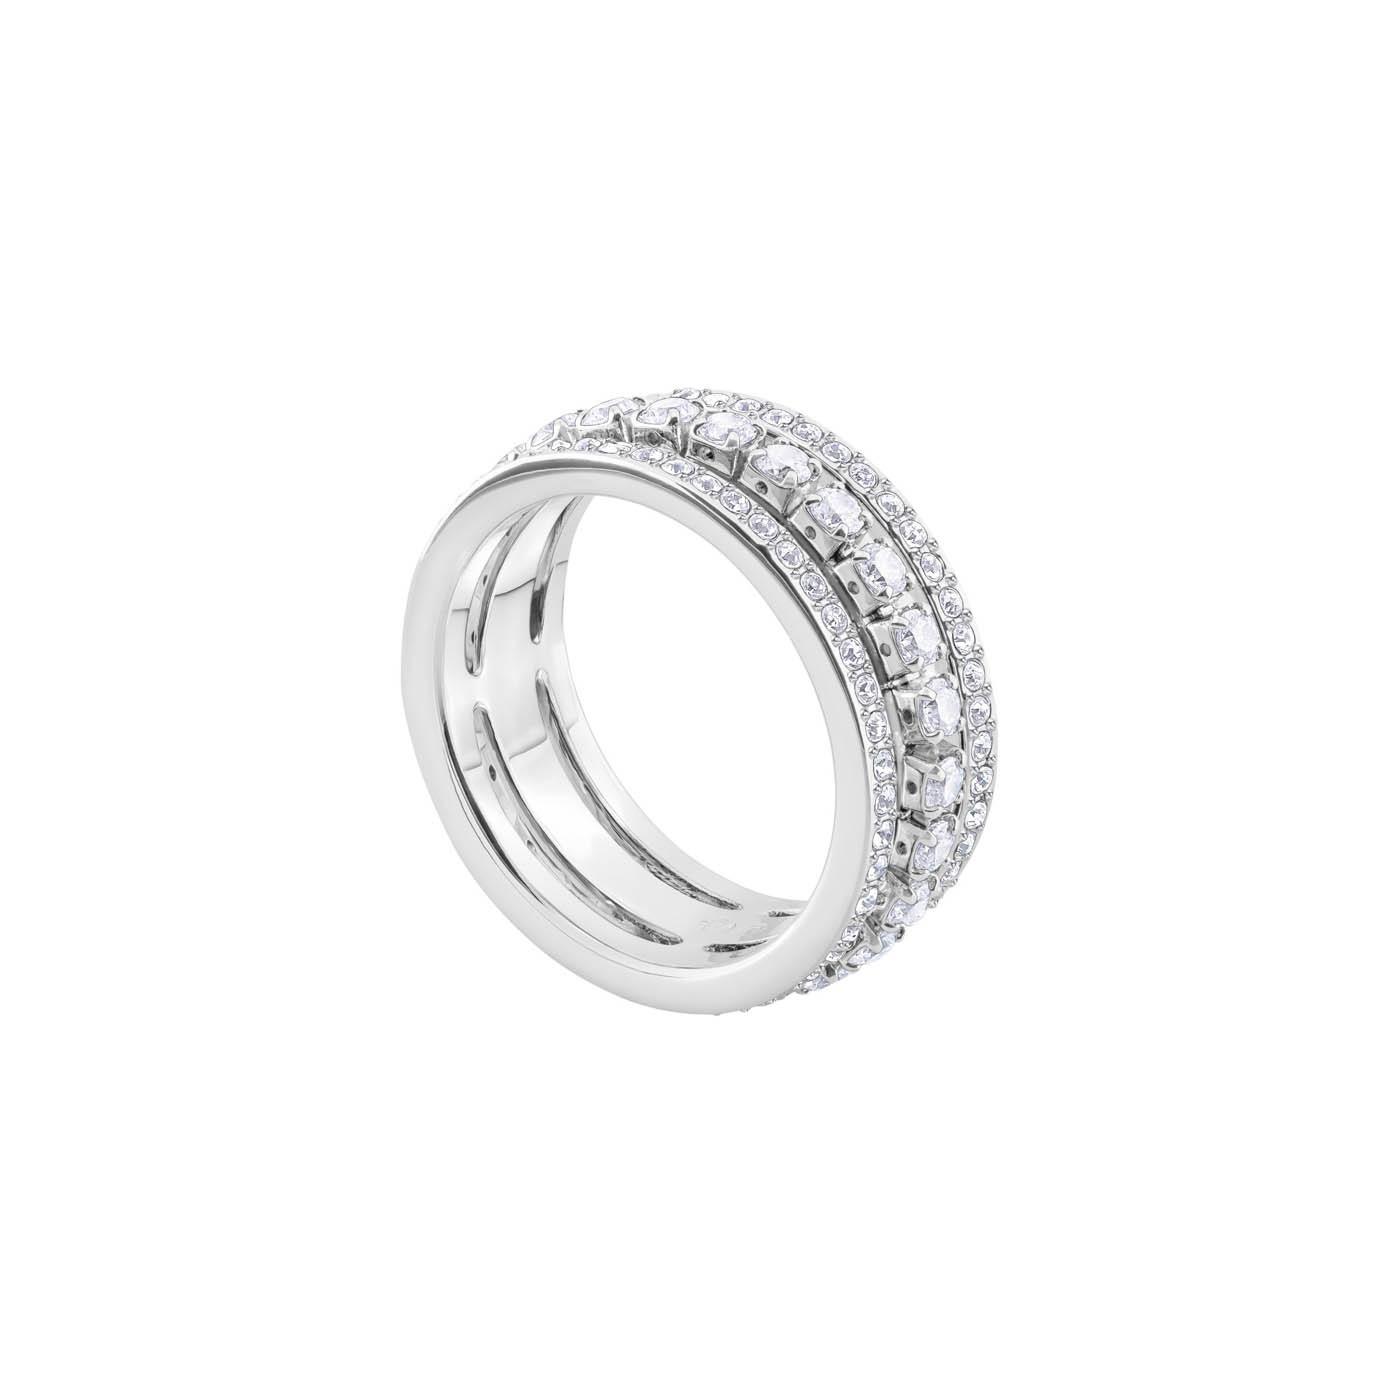 Swarovski Further Ring